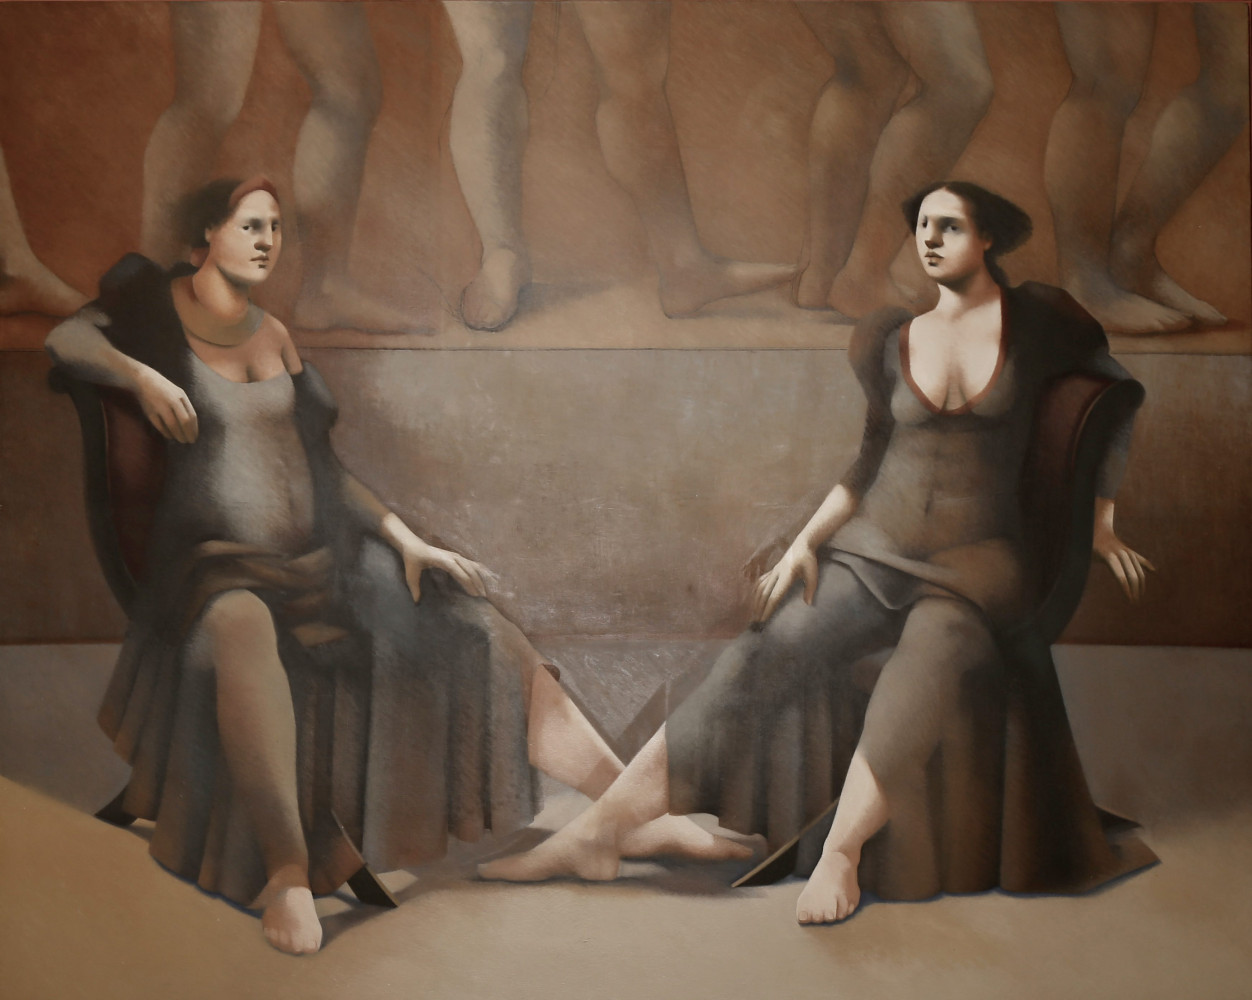 Dancers by Hayes Friedman